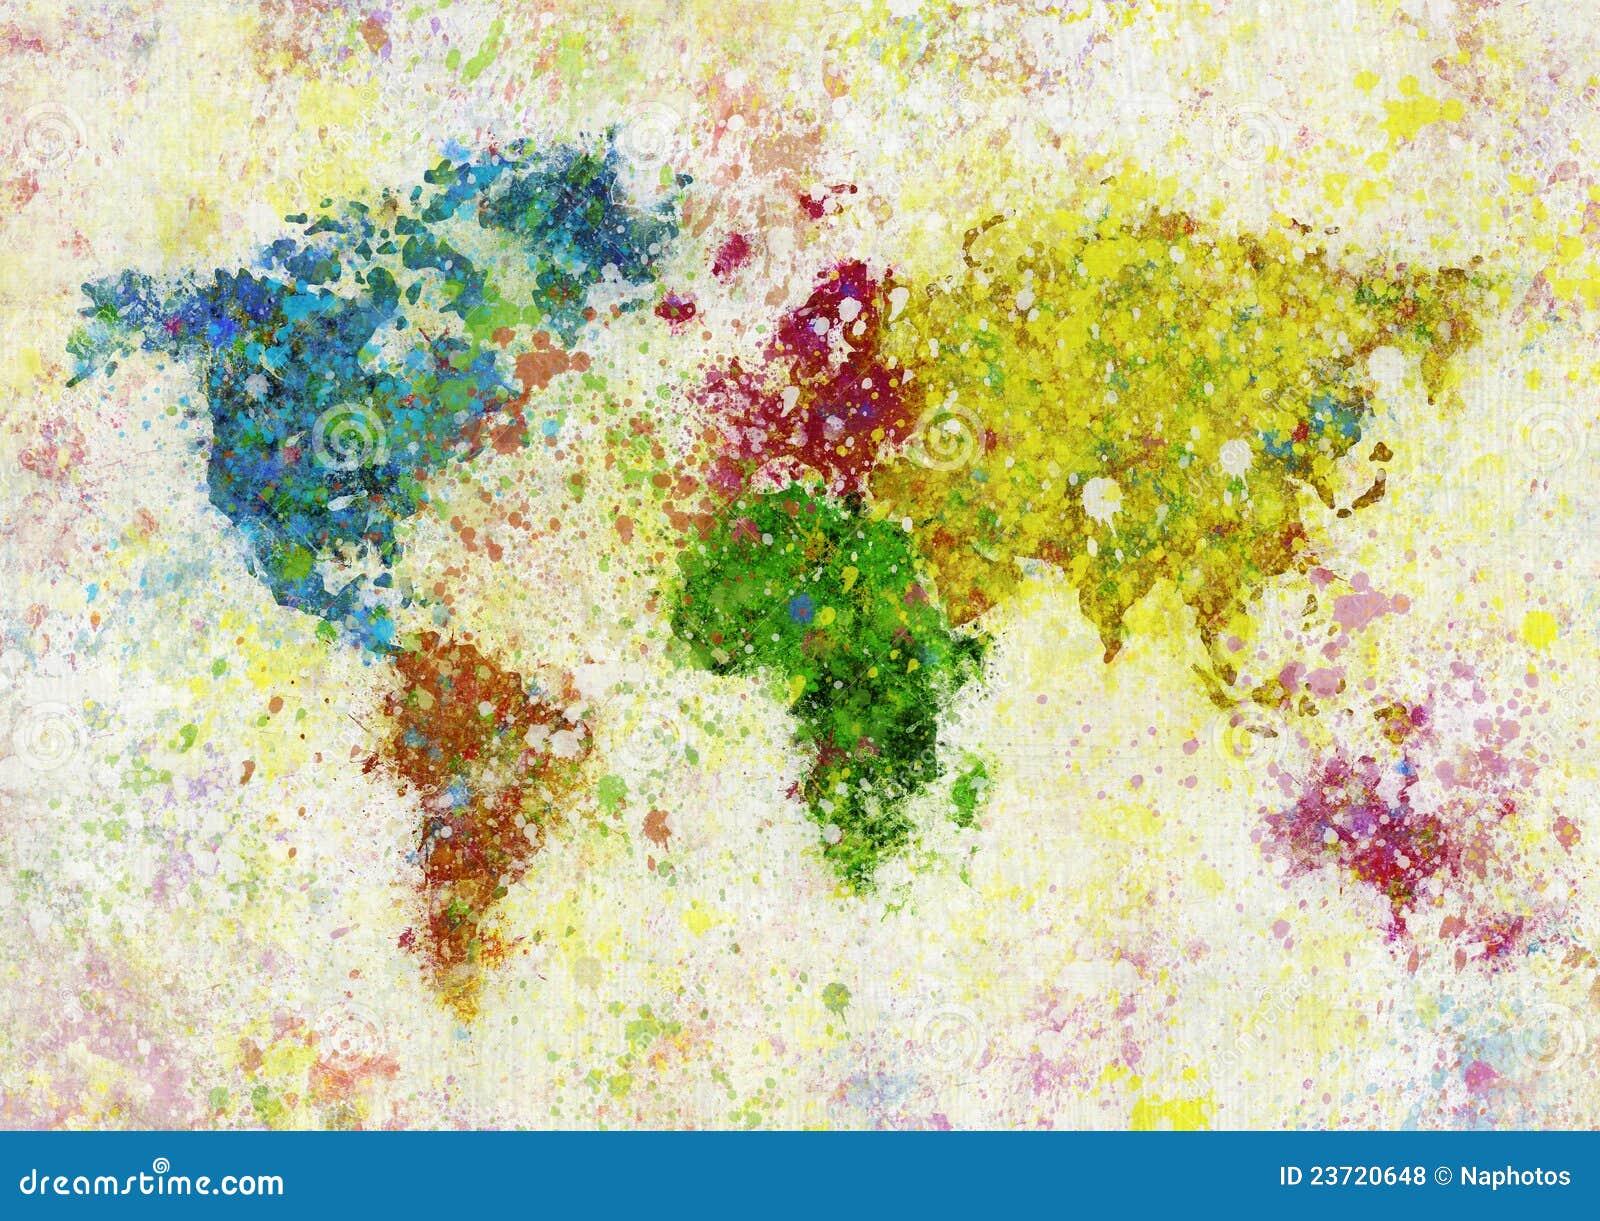 World map painting stock illustration illustration of directional world map painting royalty free stock photos gumiabroncs Images